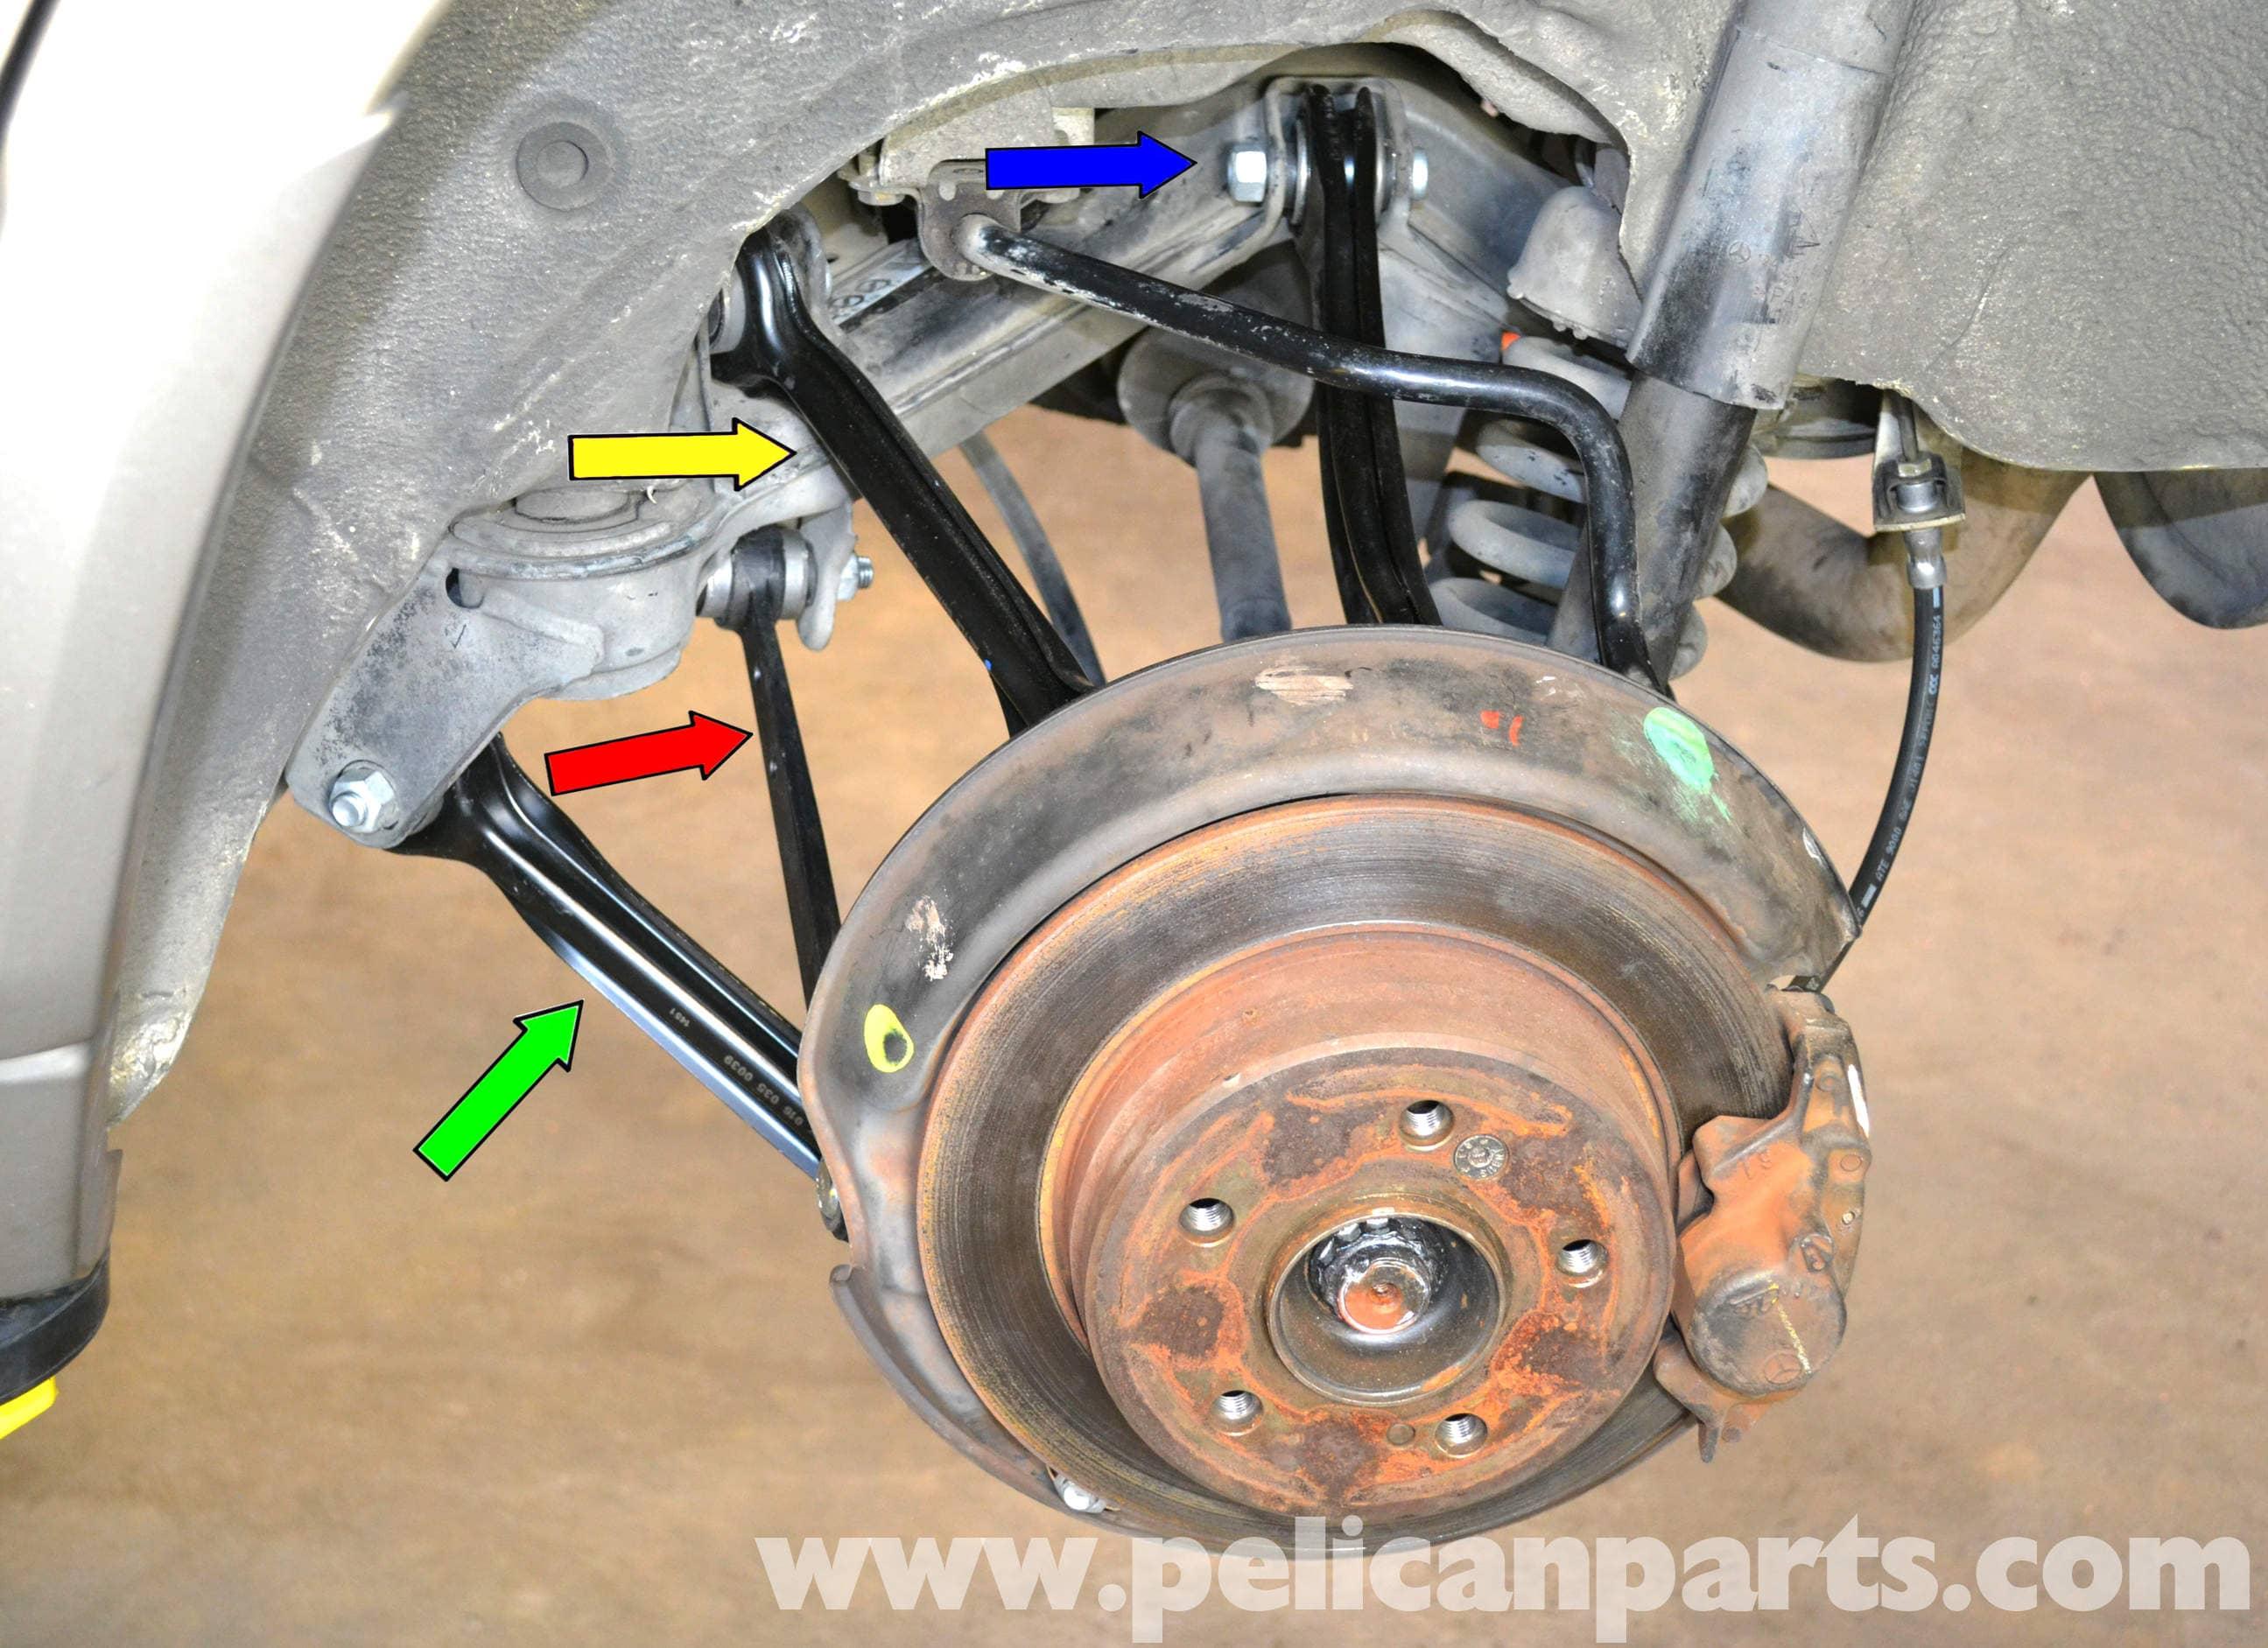 Mercedes-Benz 190E Rear Multi-Link Suspension Replacement